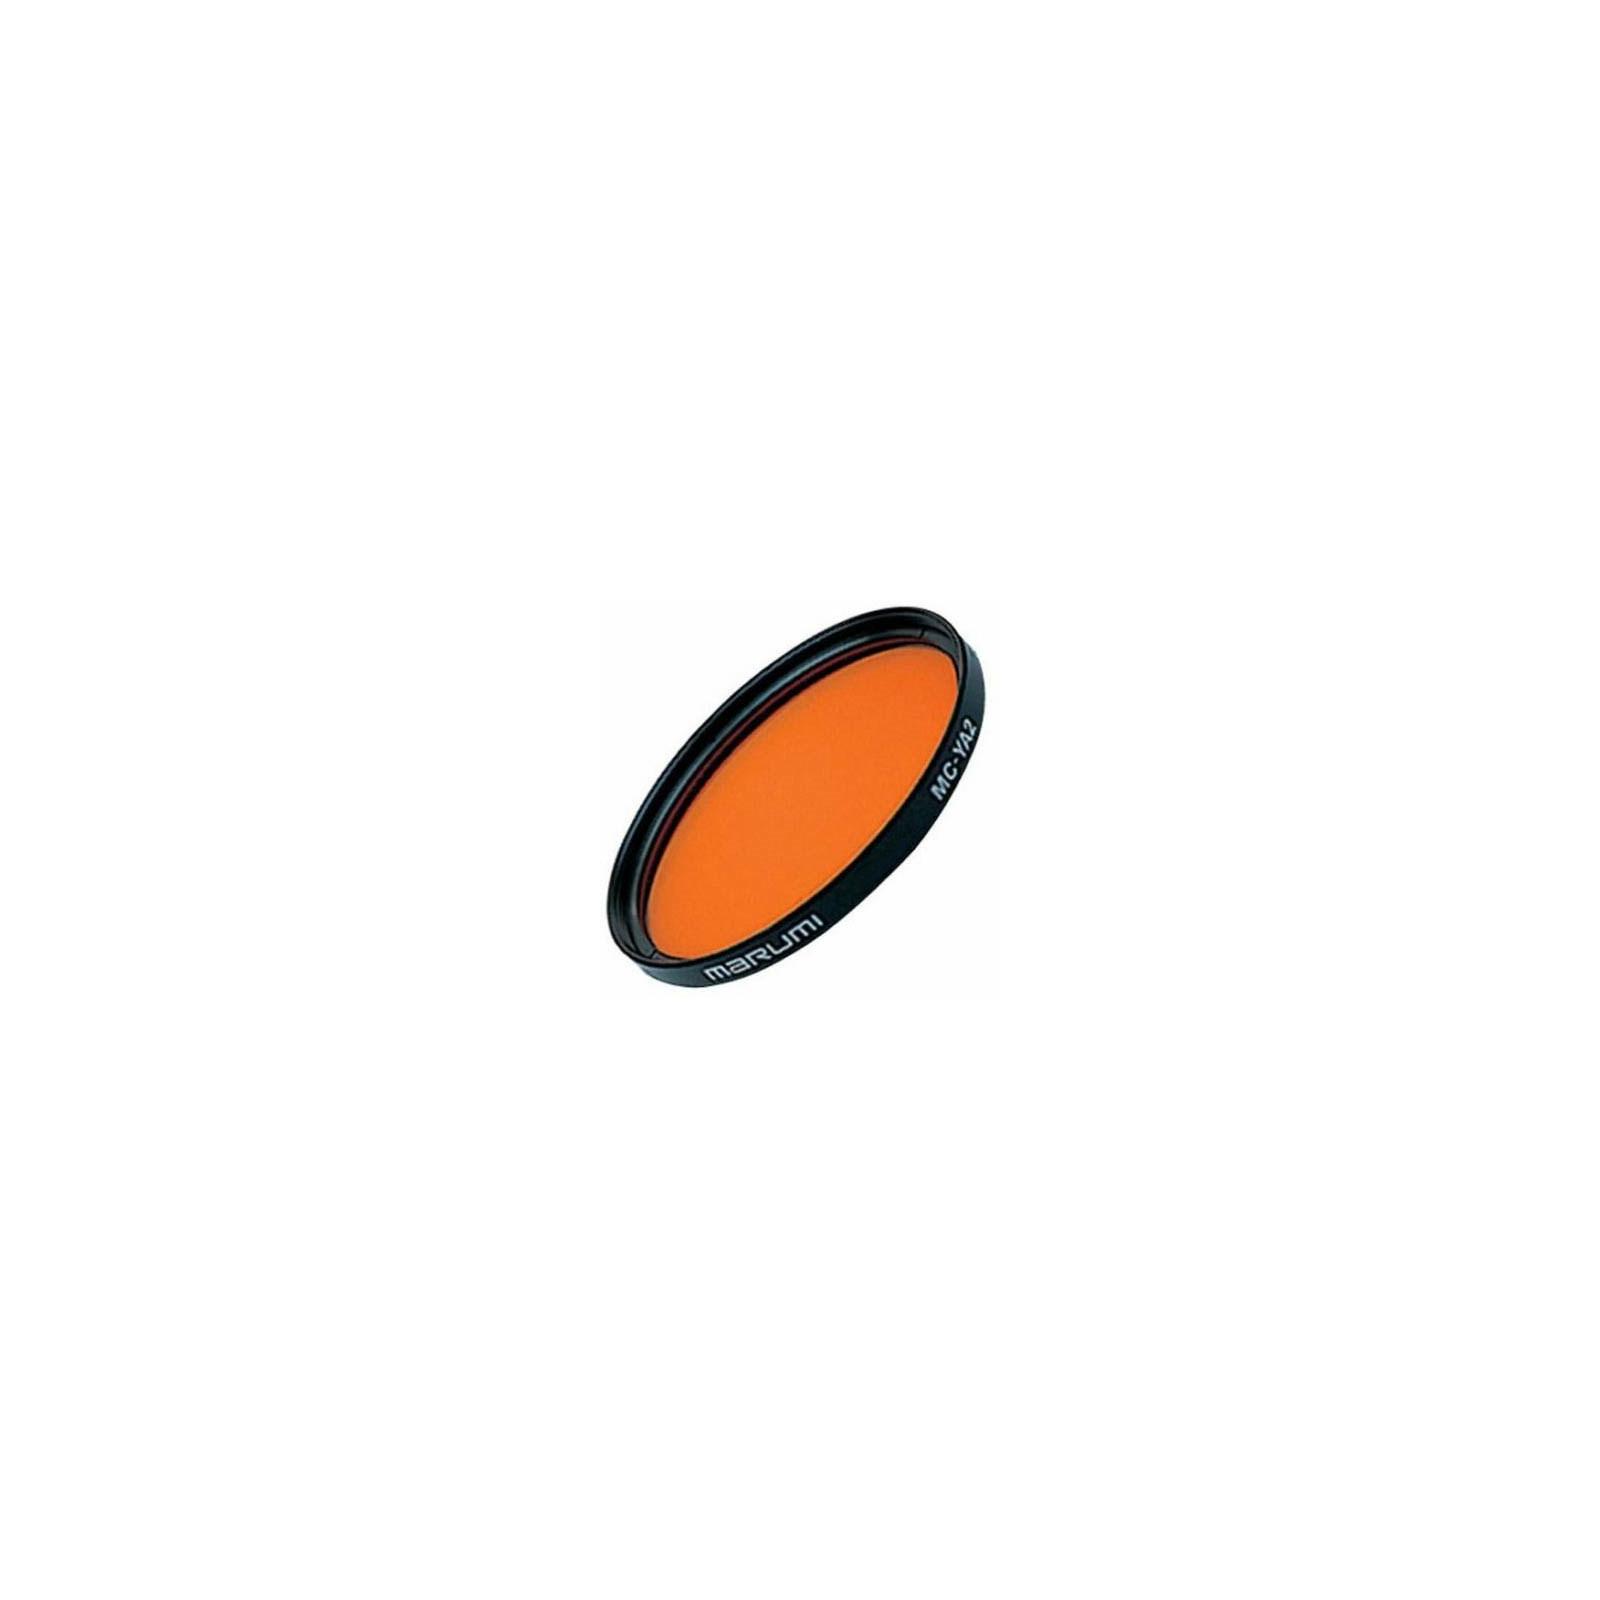 Светофильтр Marumi YА2 (orange) 77mm (Y2 (orange) 77mm)